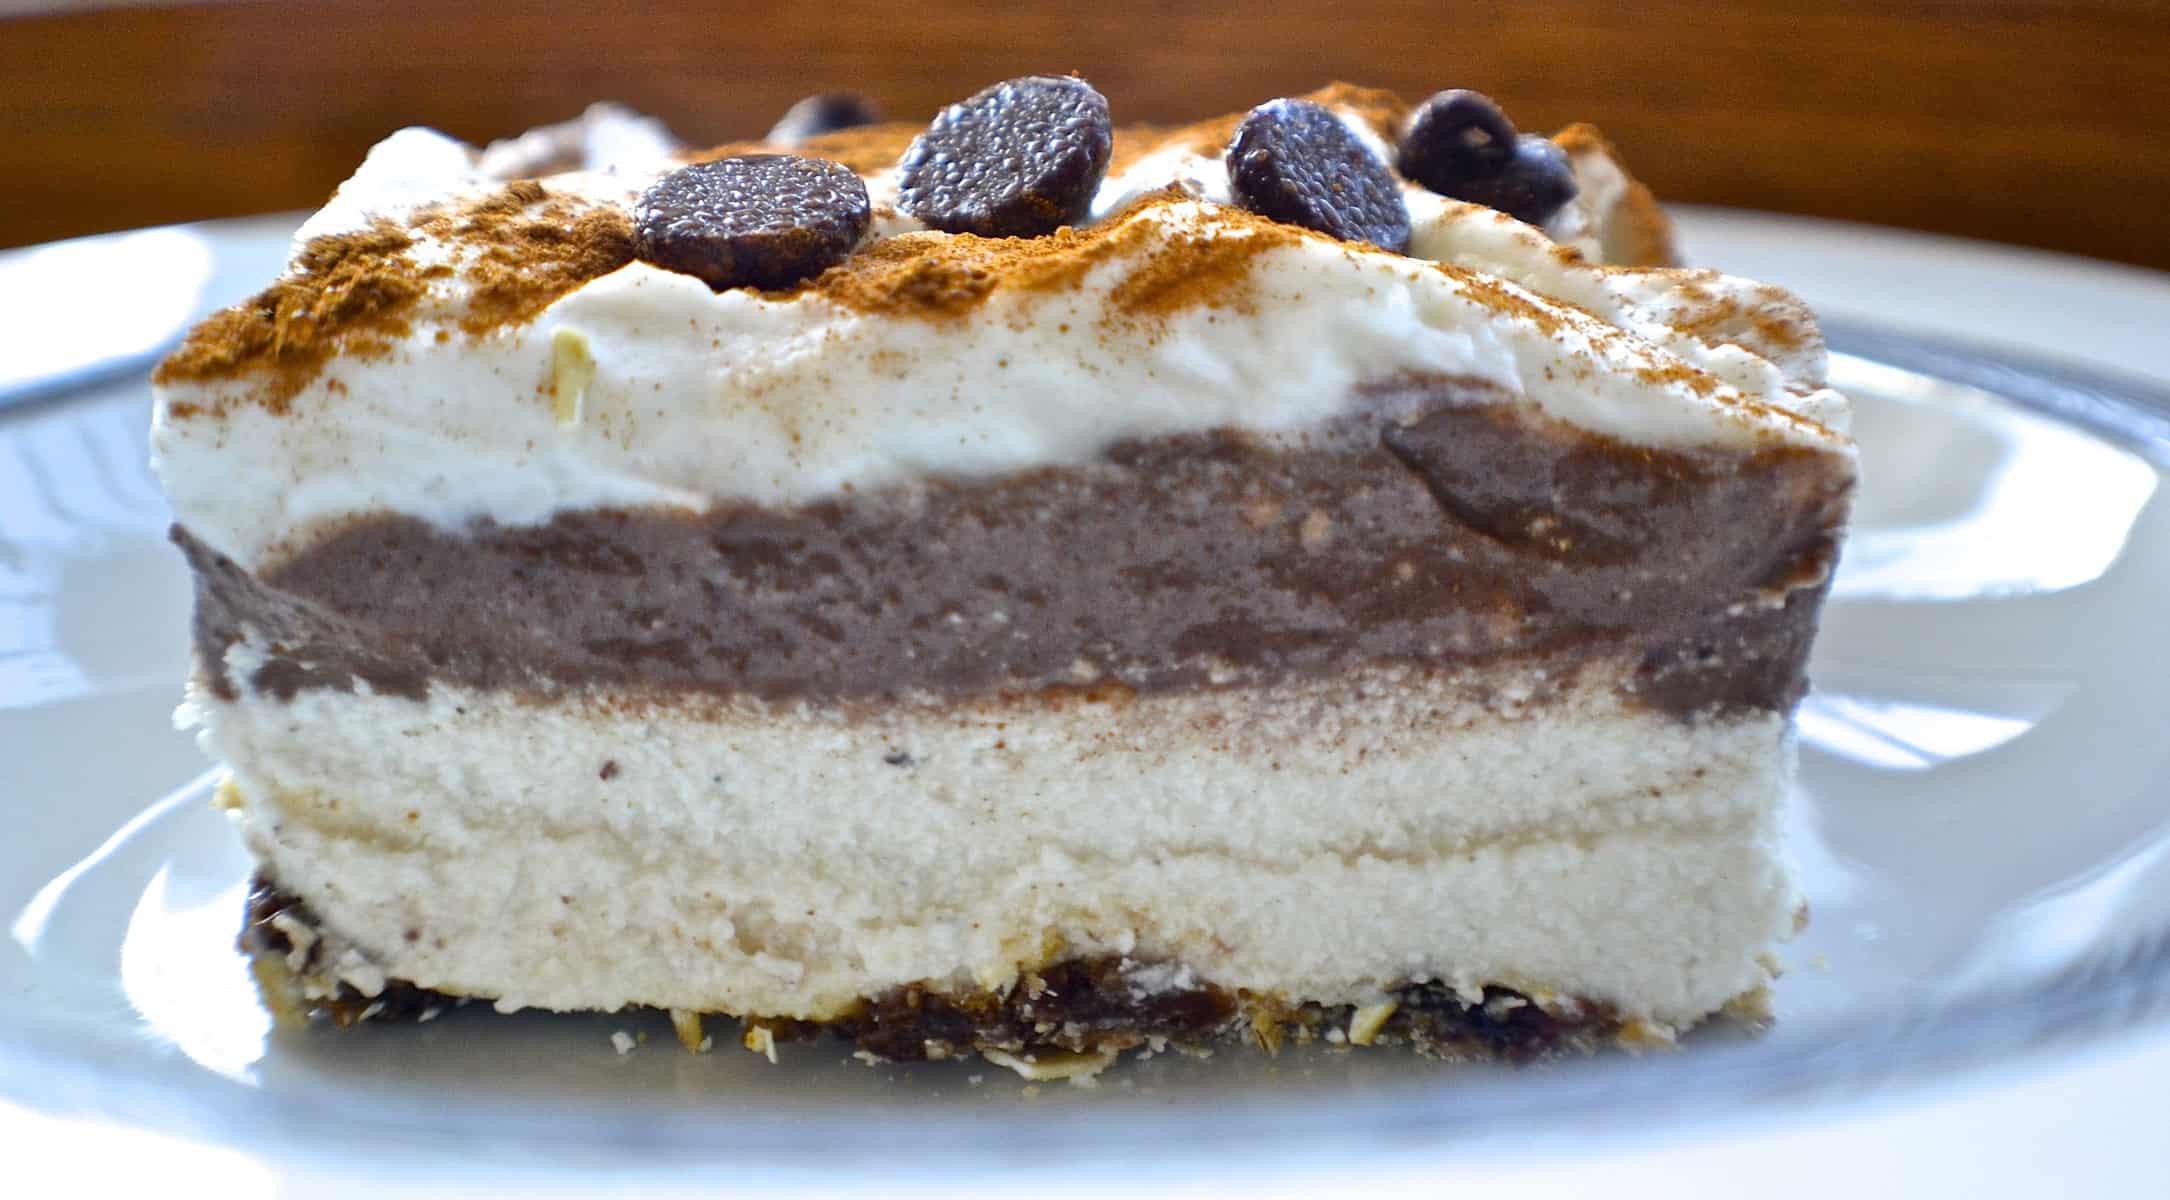 Best Desserts Recipes  The best vegan chocolate dessert recipe ever